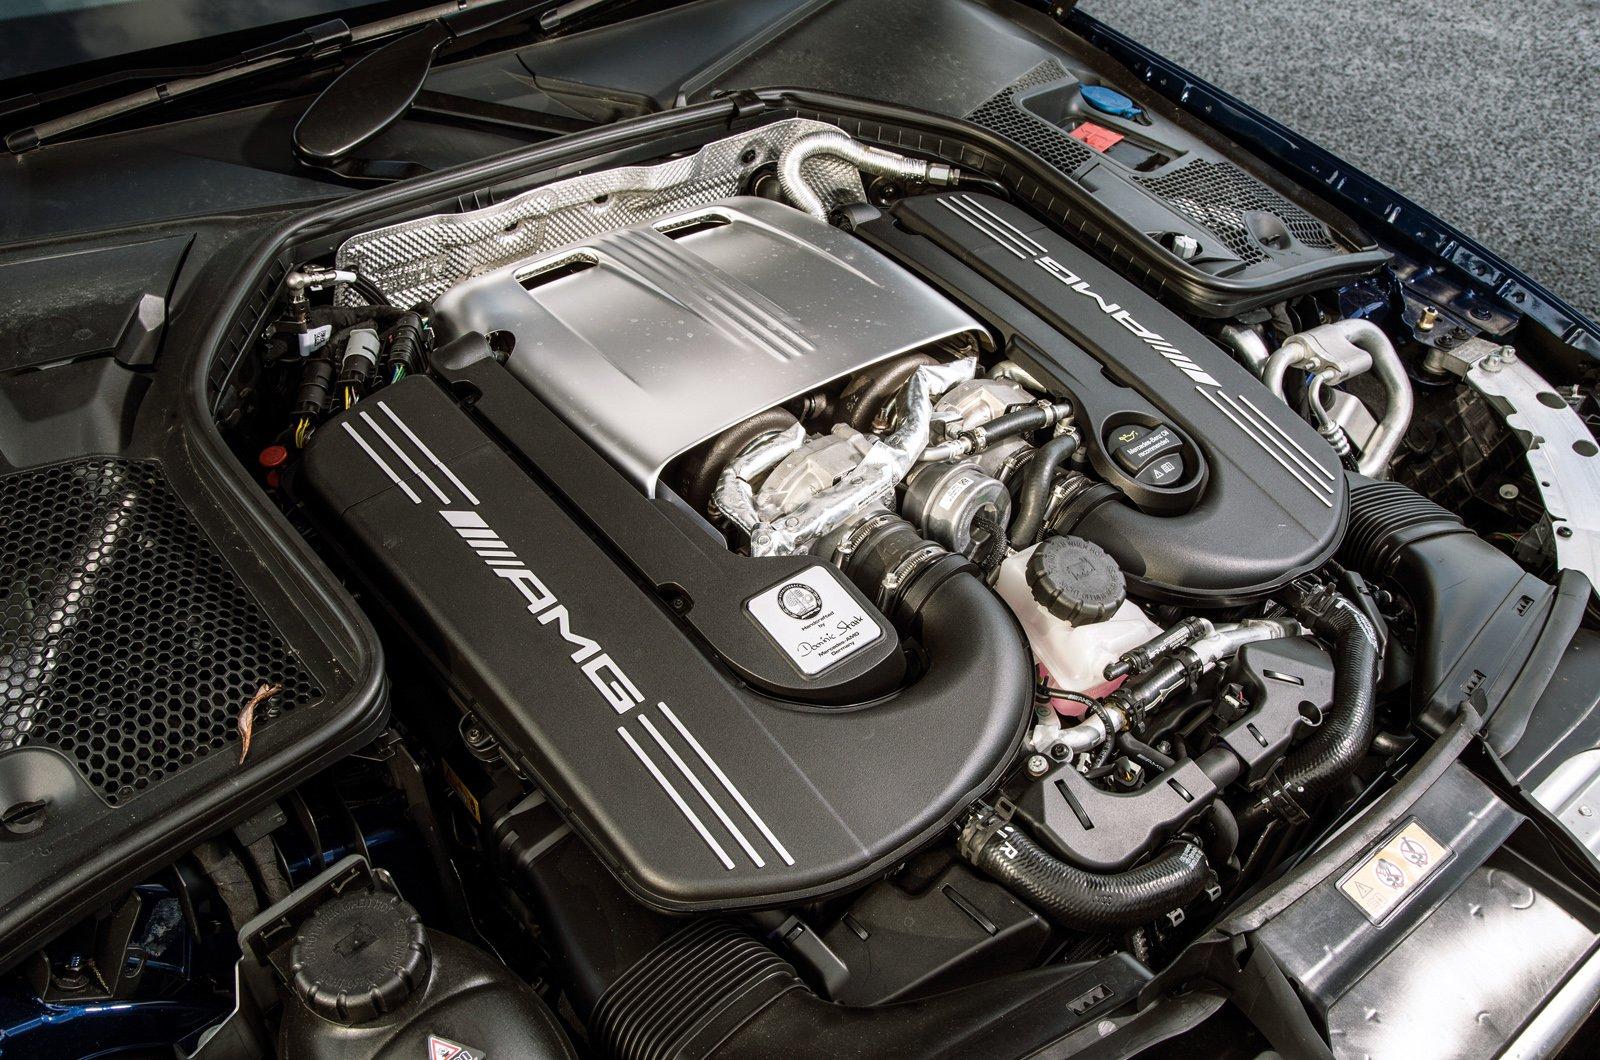 Mercedes-AMG C63 S Estate engine